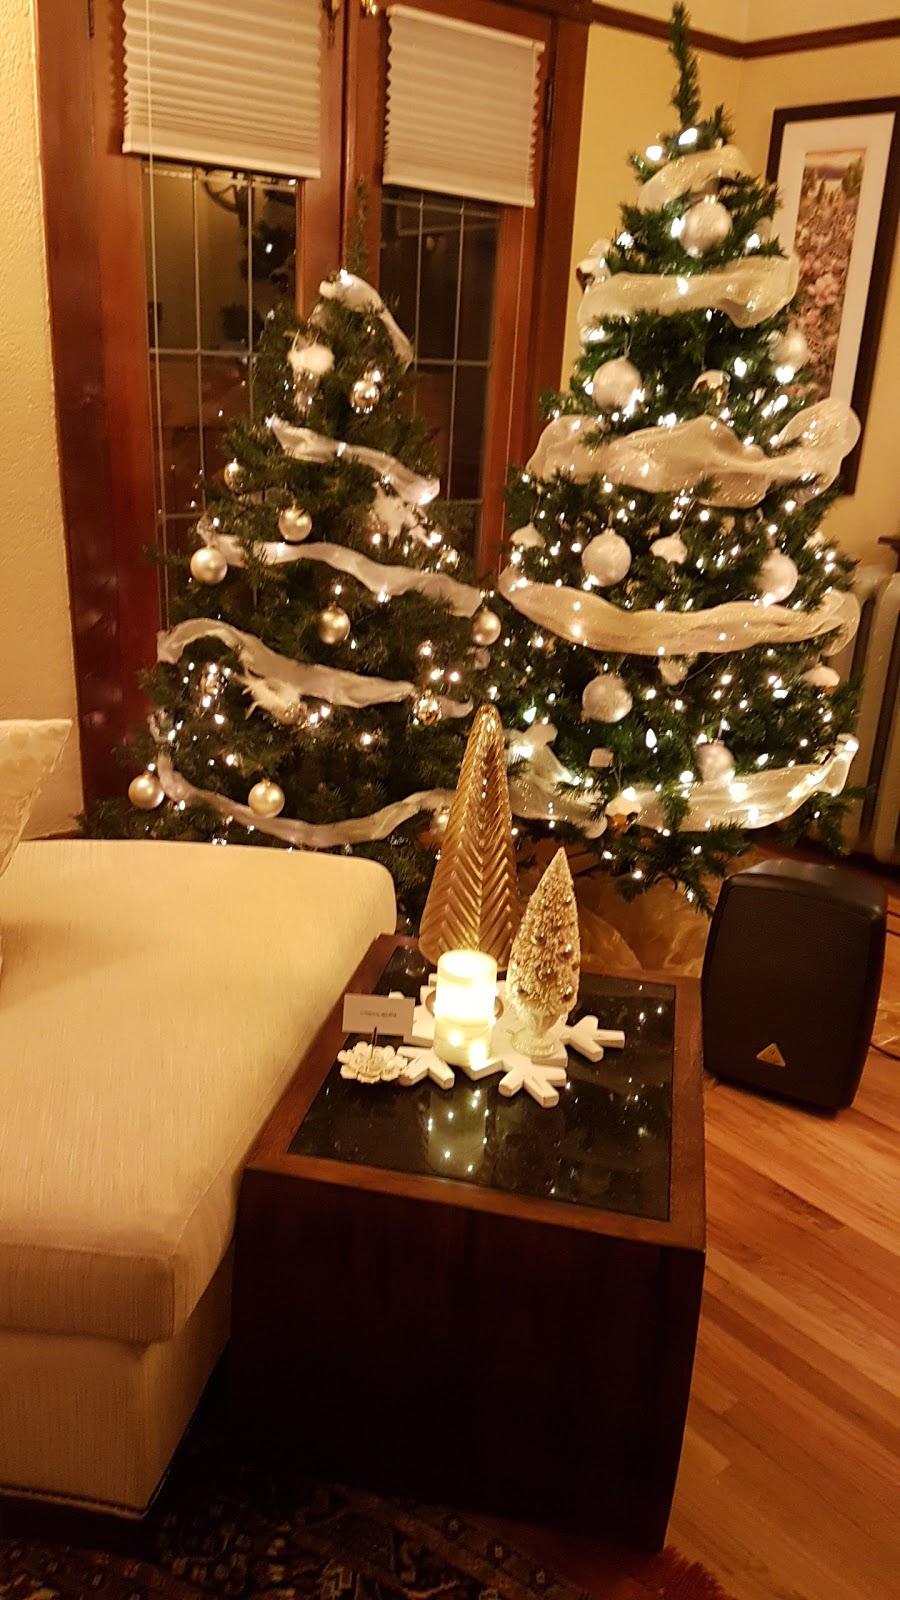 Christleton Manor Luxury Bed & Breakfast   lodging   423 Christleton Ave, Kelowna, BC V1Y 5H9, Canada   2504700298 OR +1 250-470-0298